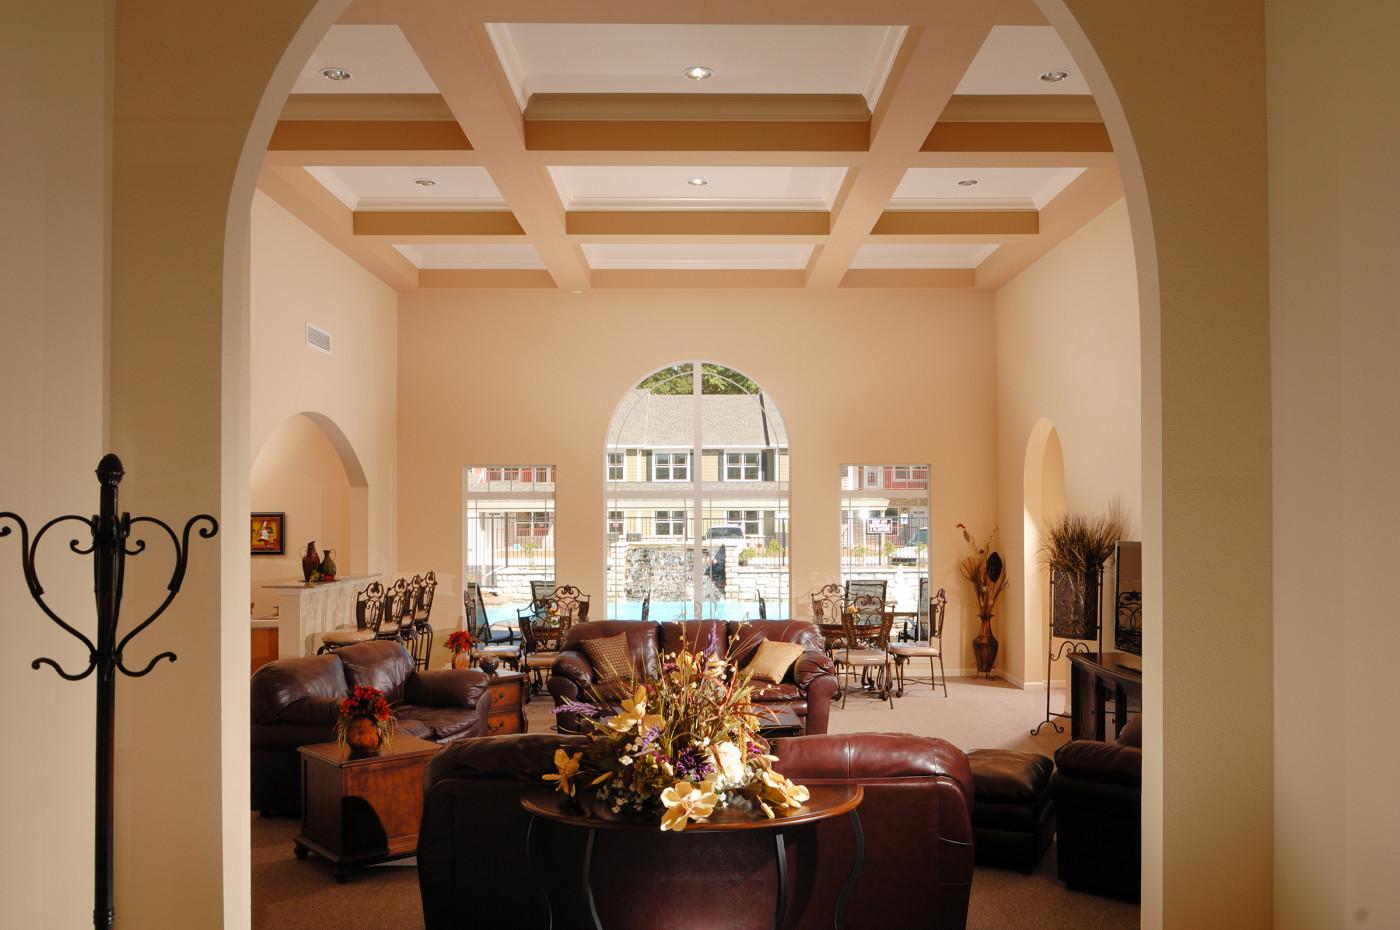 Club-House-Interior-1